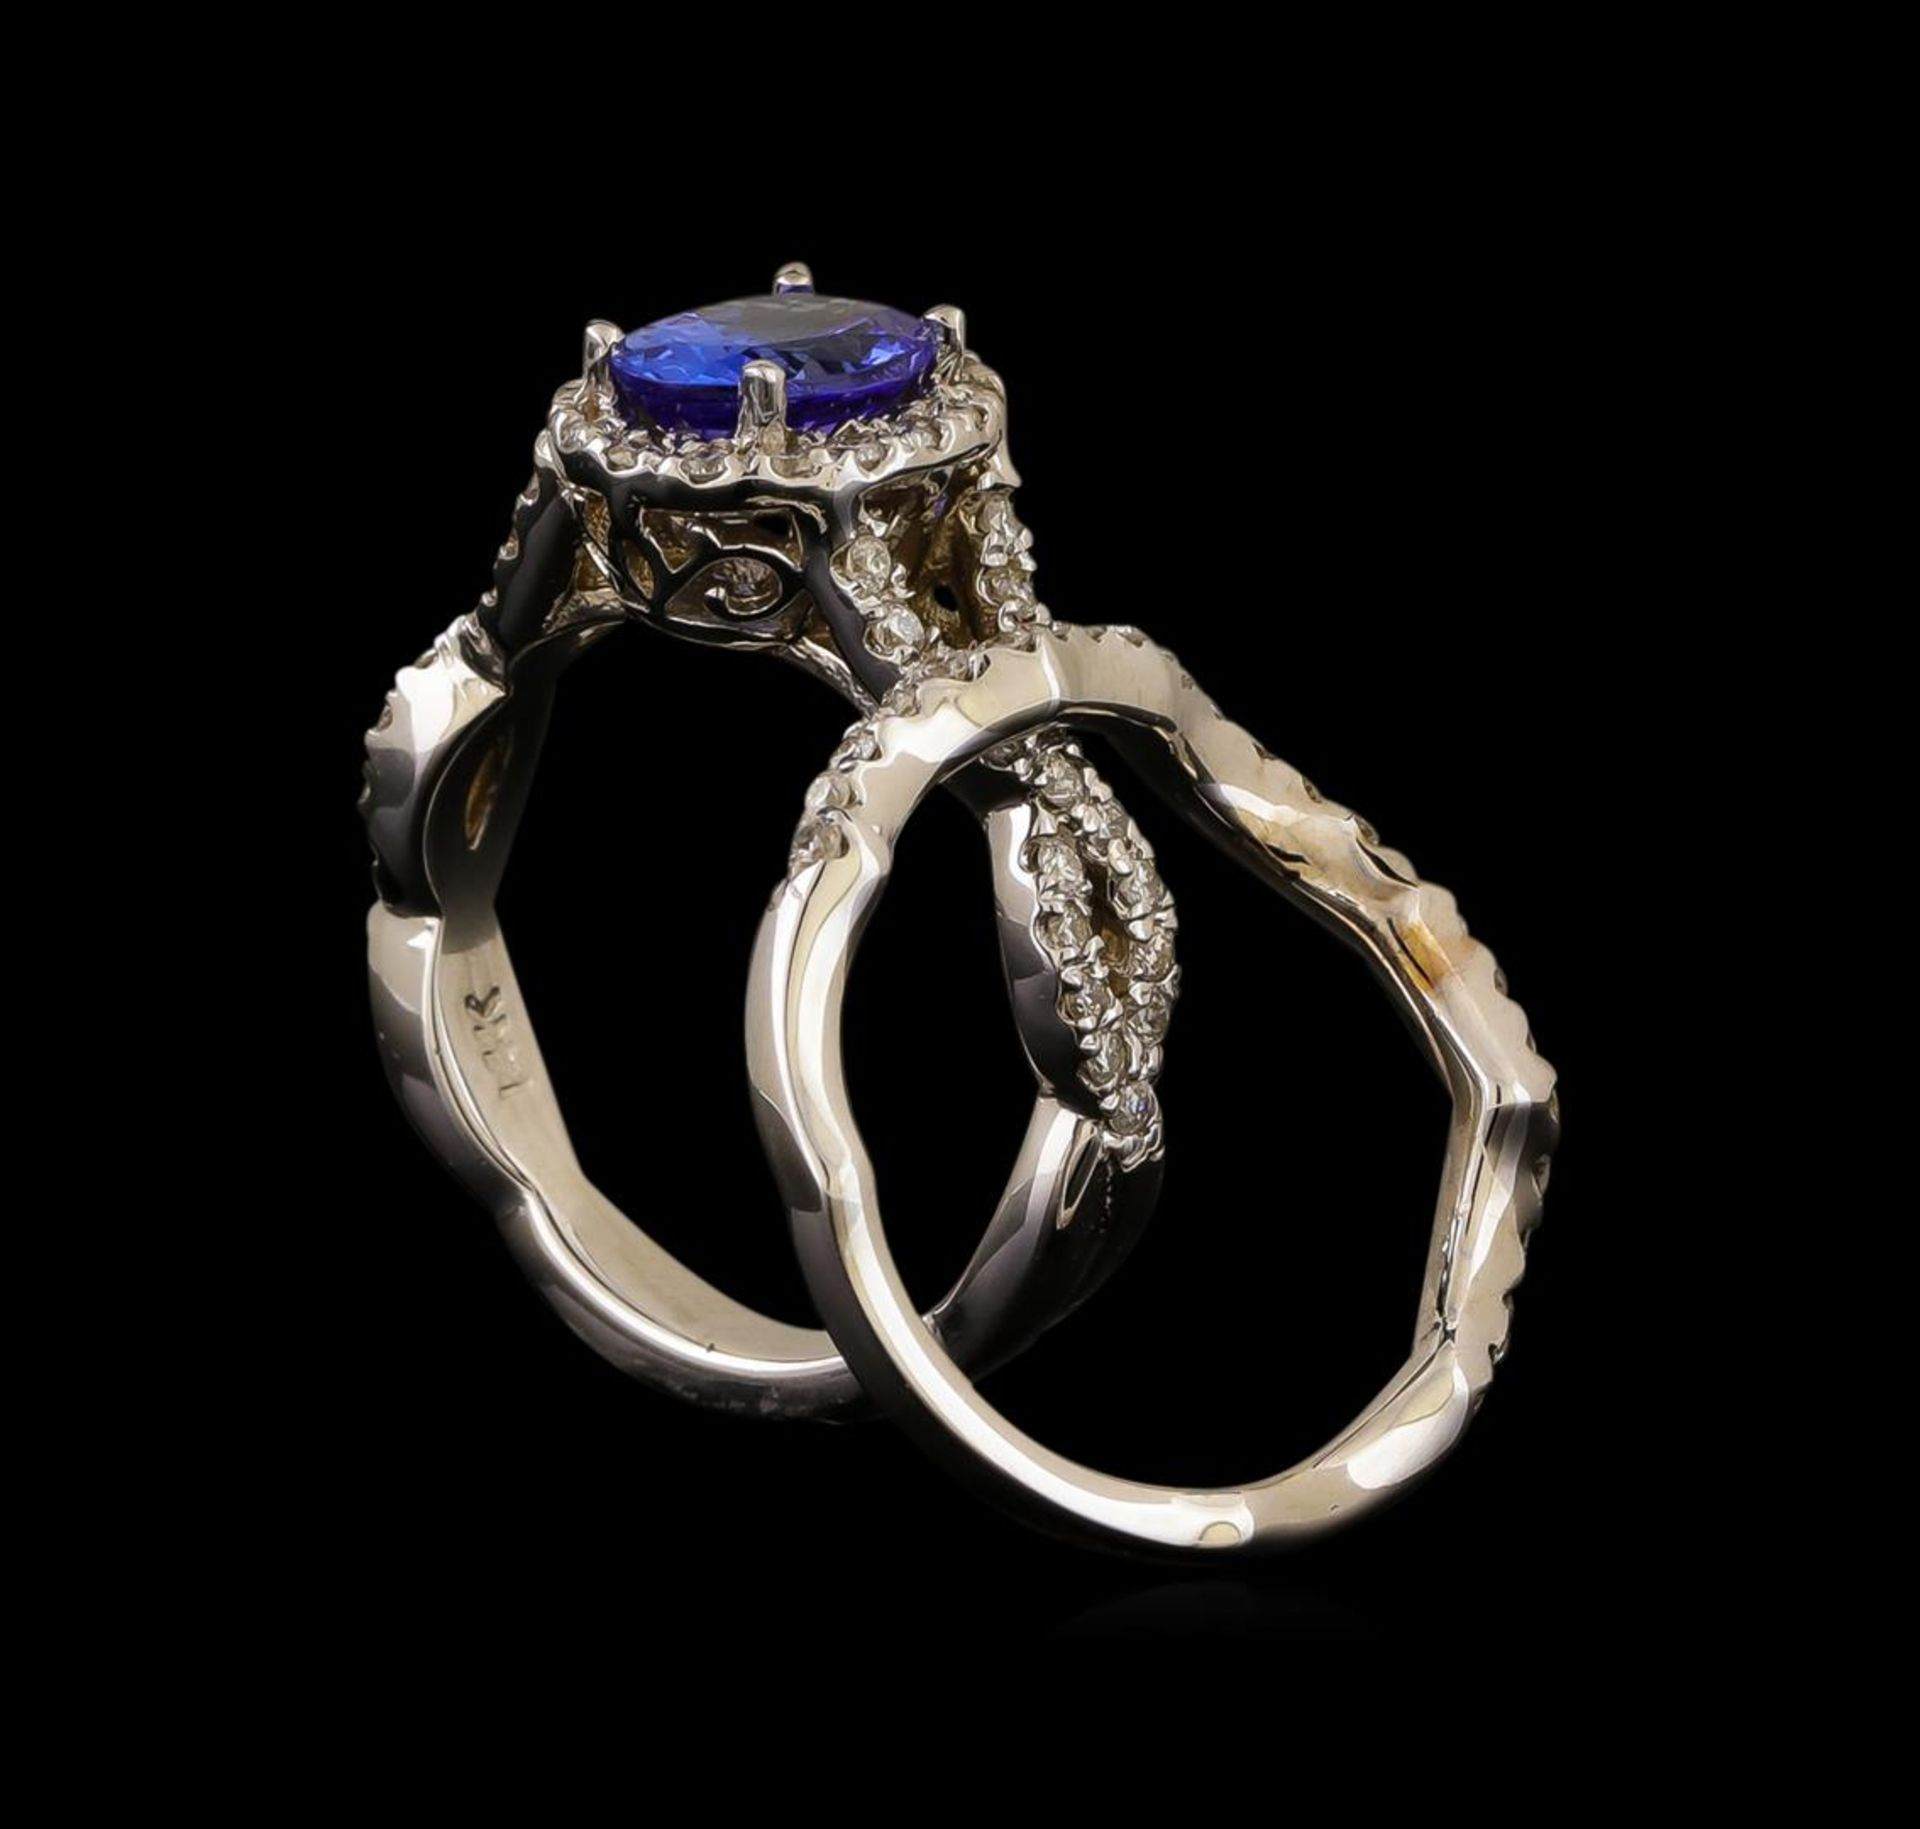 14KT White Gold 1.44 ctw Tanzanite and Diamond Ring - Image 3 of 4